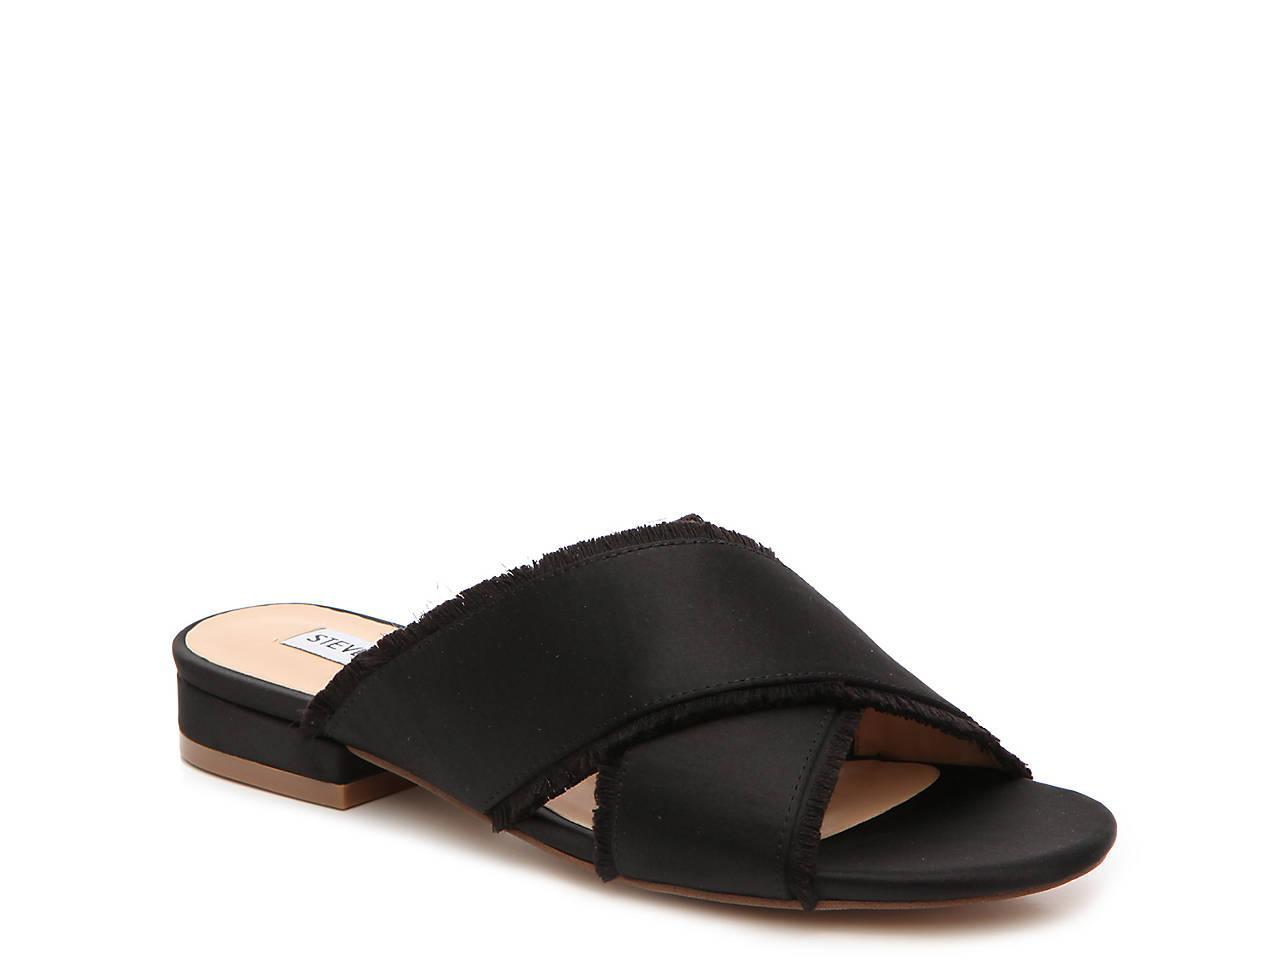 3815be4a60f Steve Madden Syruss Flat Sandal Women s Shoes